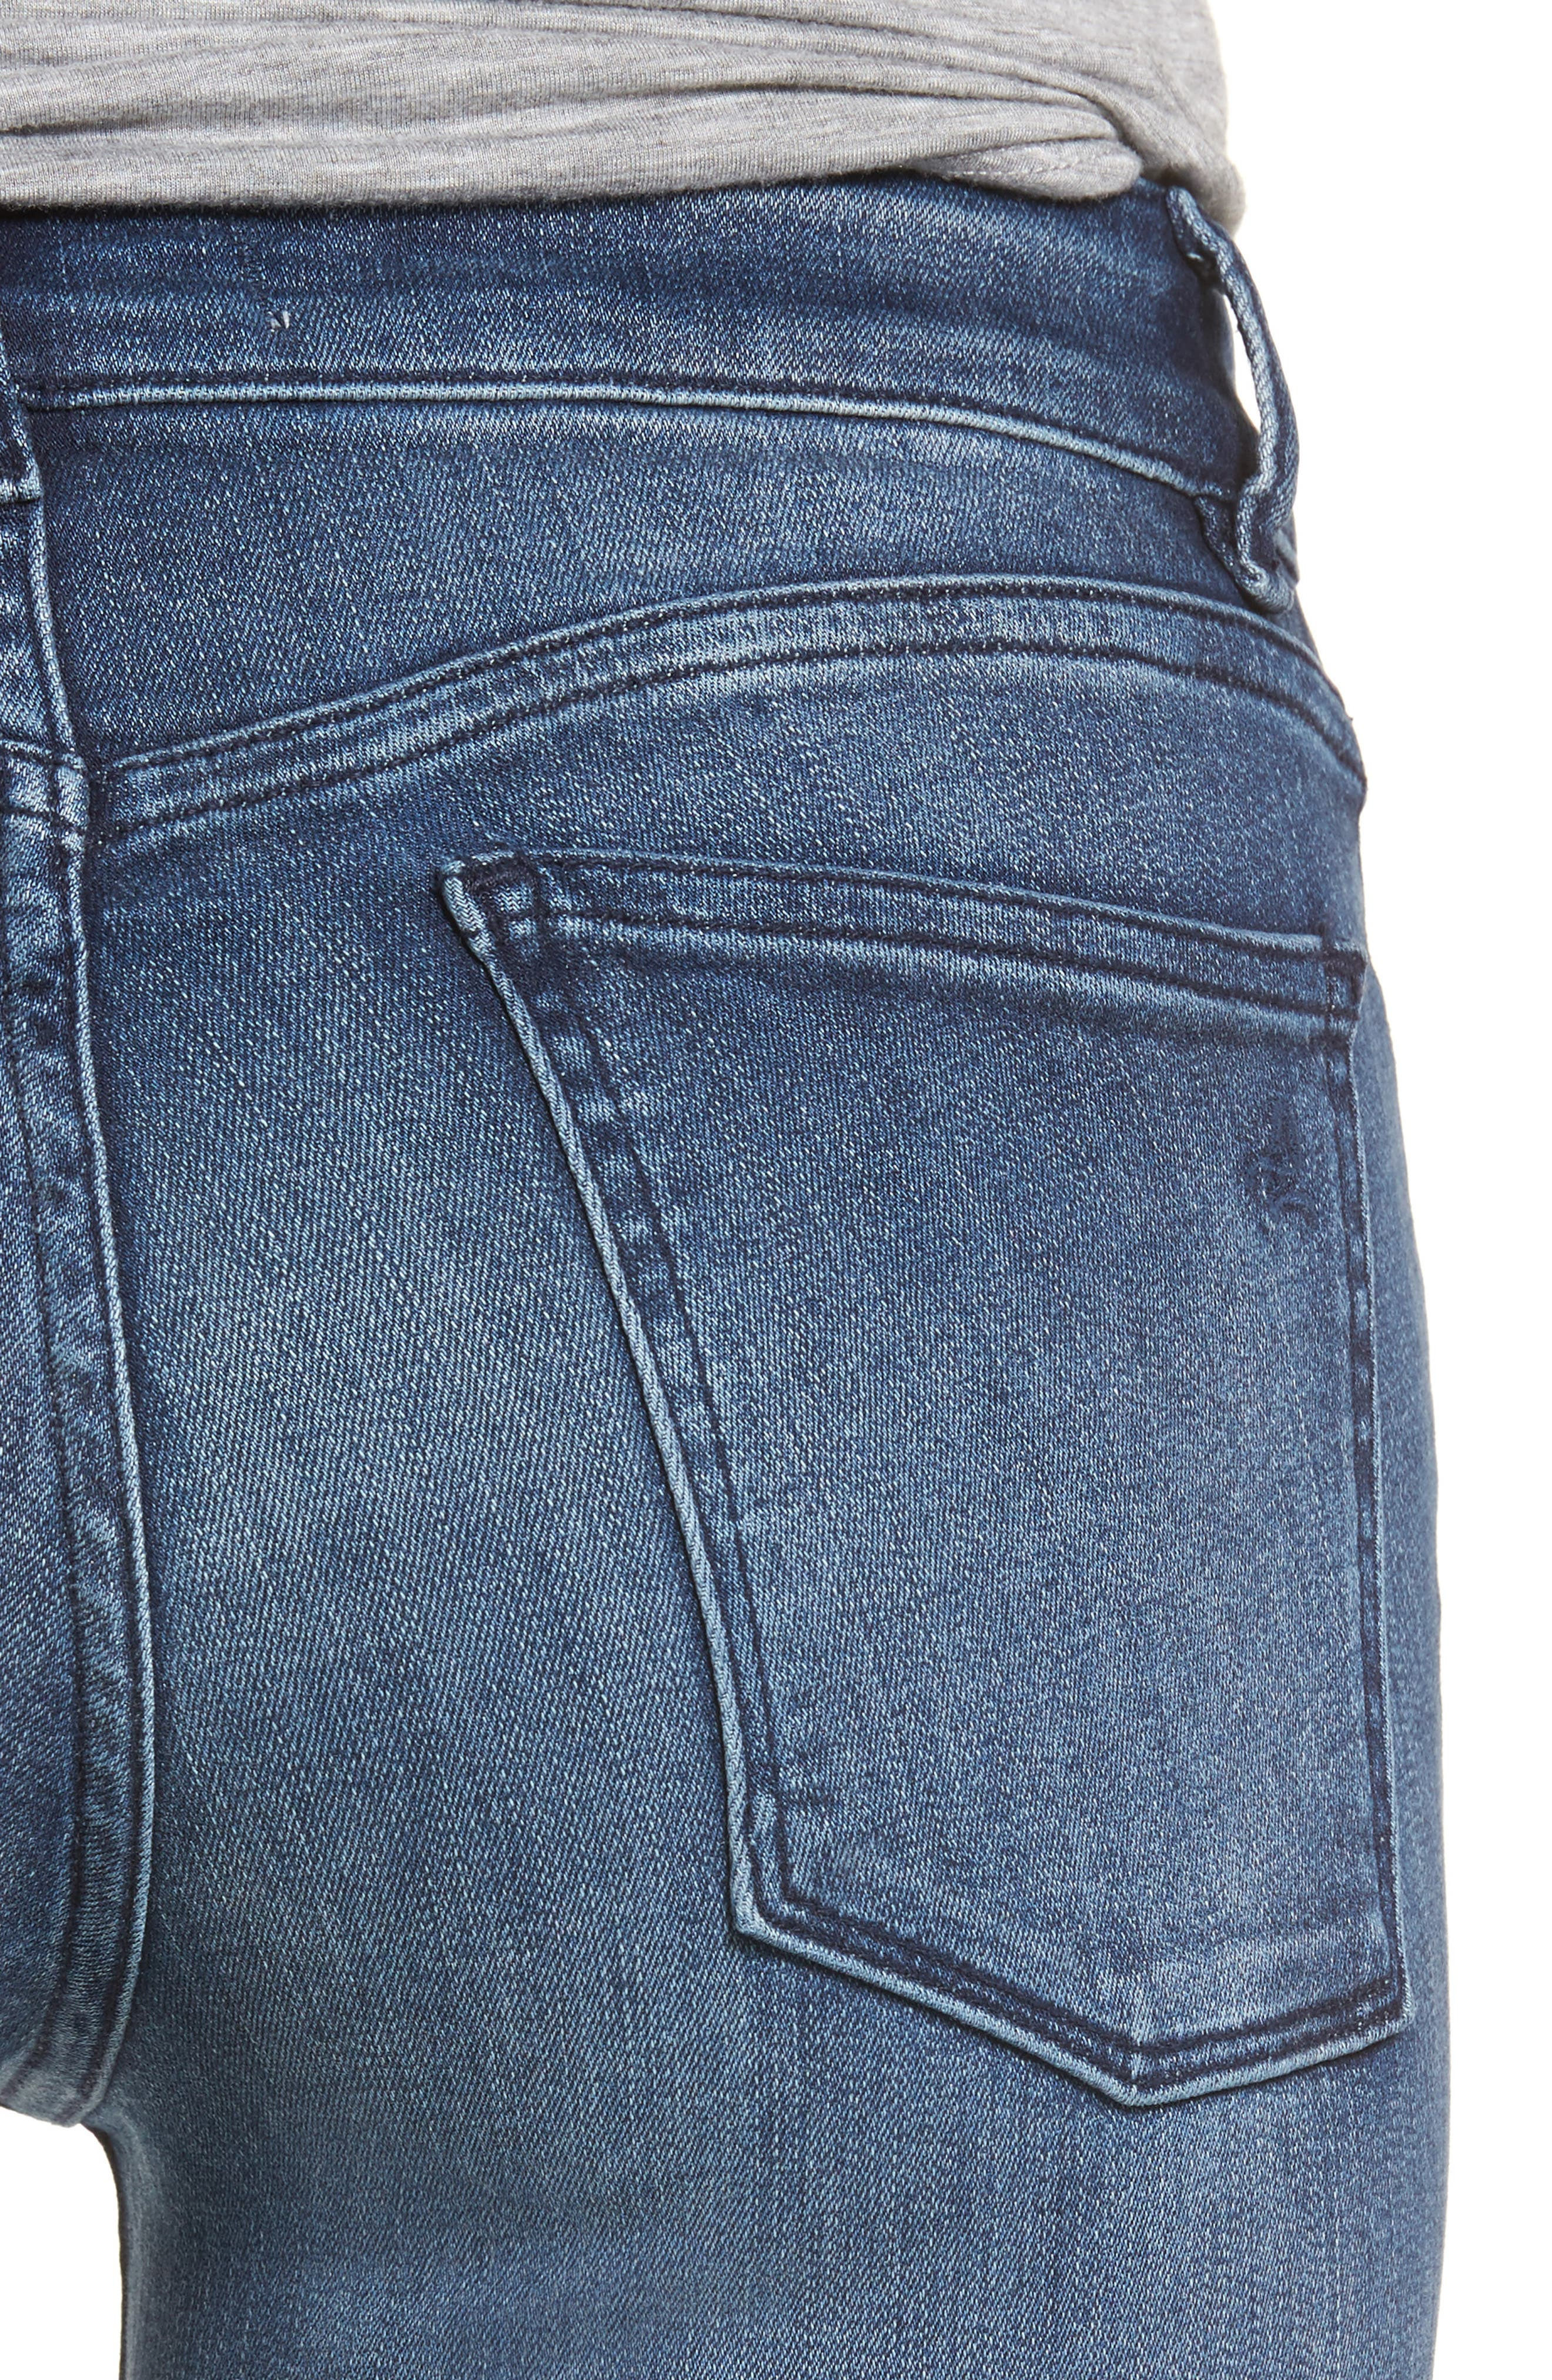 Emma Power Legging Jeans,                             Alternate thumbnail 3, color,                             Fenwick